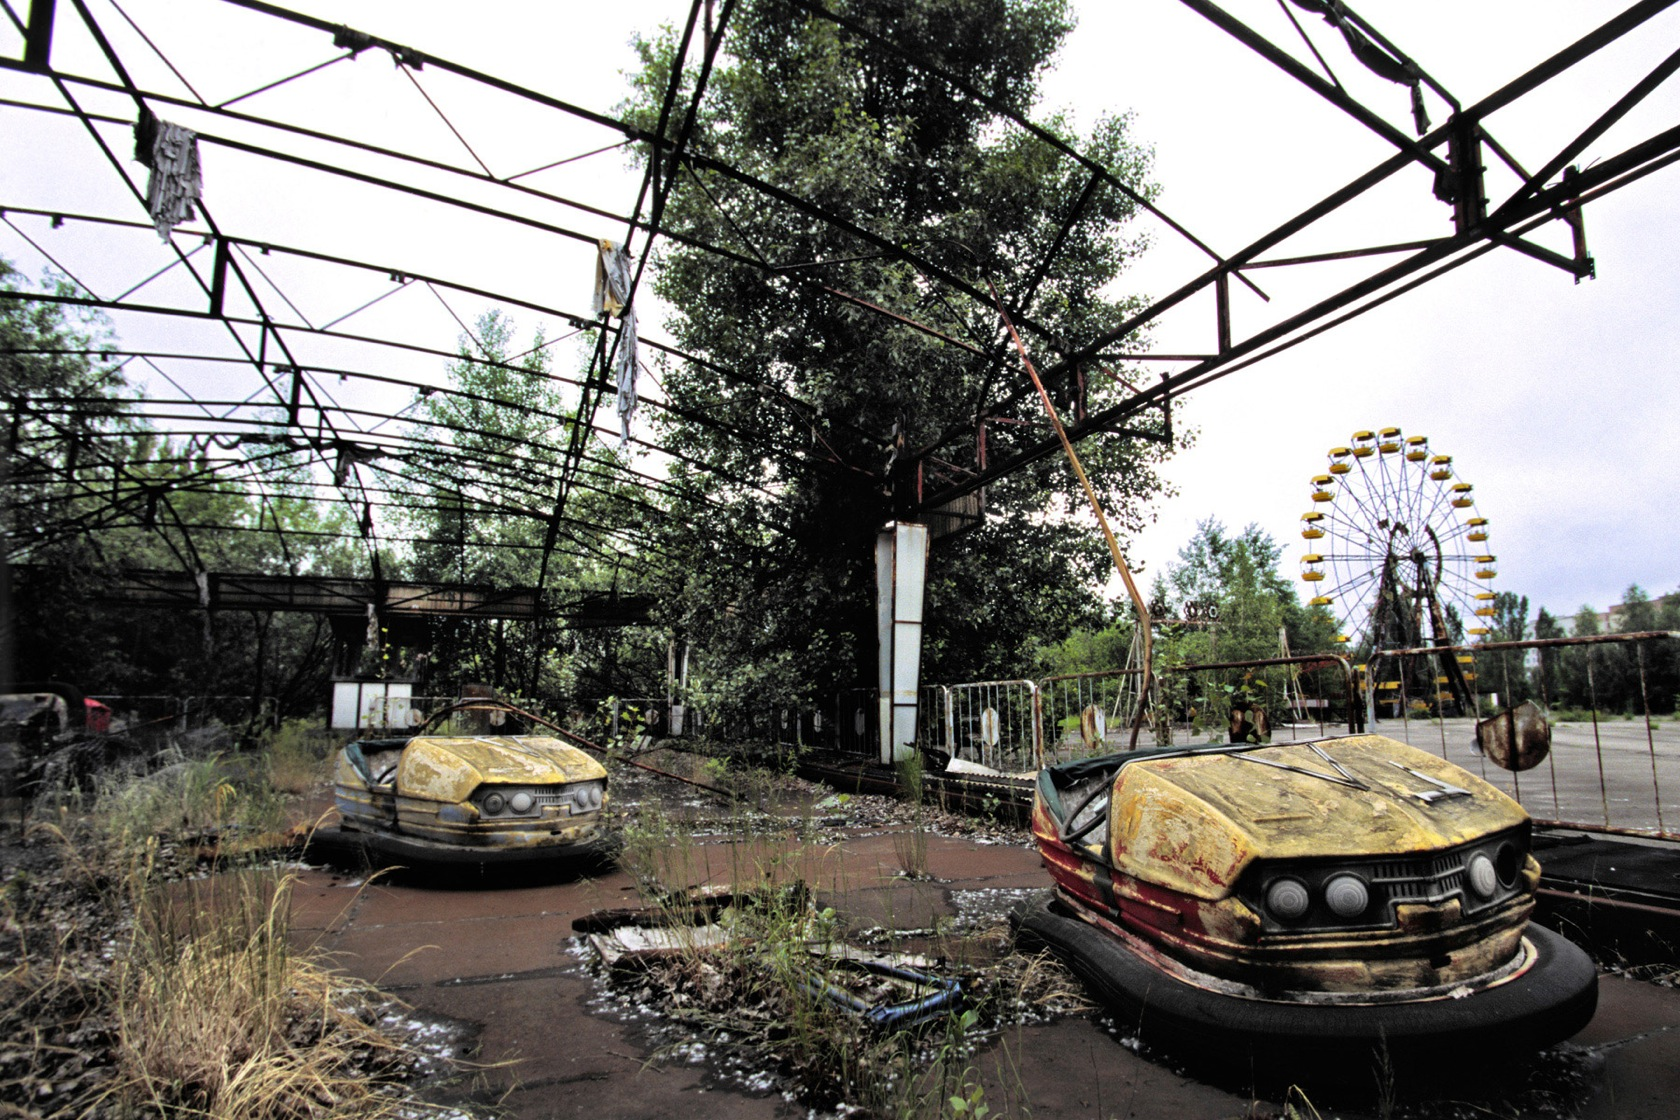 Sci Fi - Post Apocalyptic  Apocalyptic Chernobyl Wallpaper